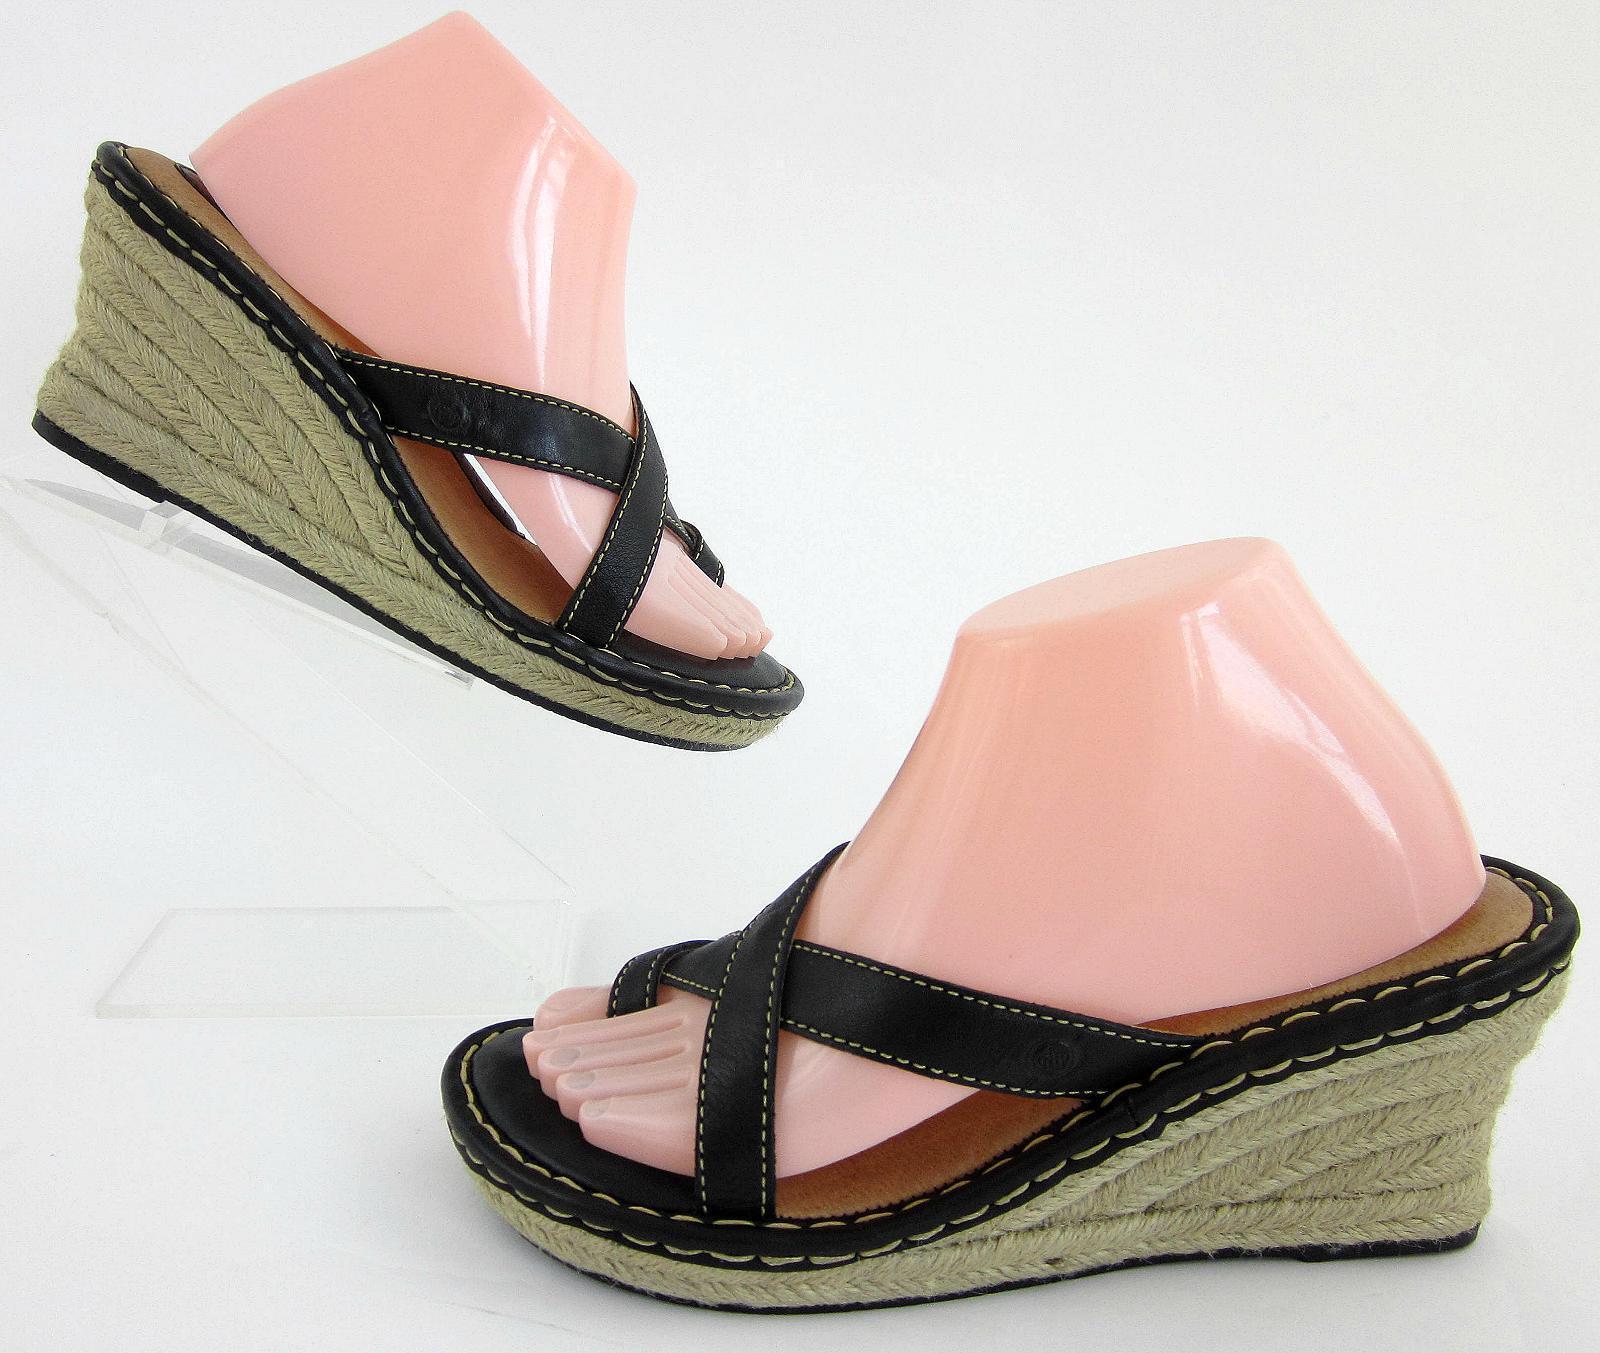 Born Womens Jute Wedge Toe Loop Sandals Black Contrast Stitch Leather Sz 9